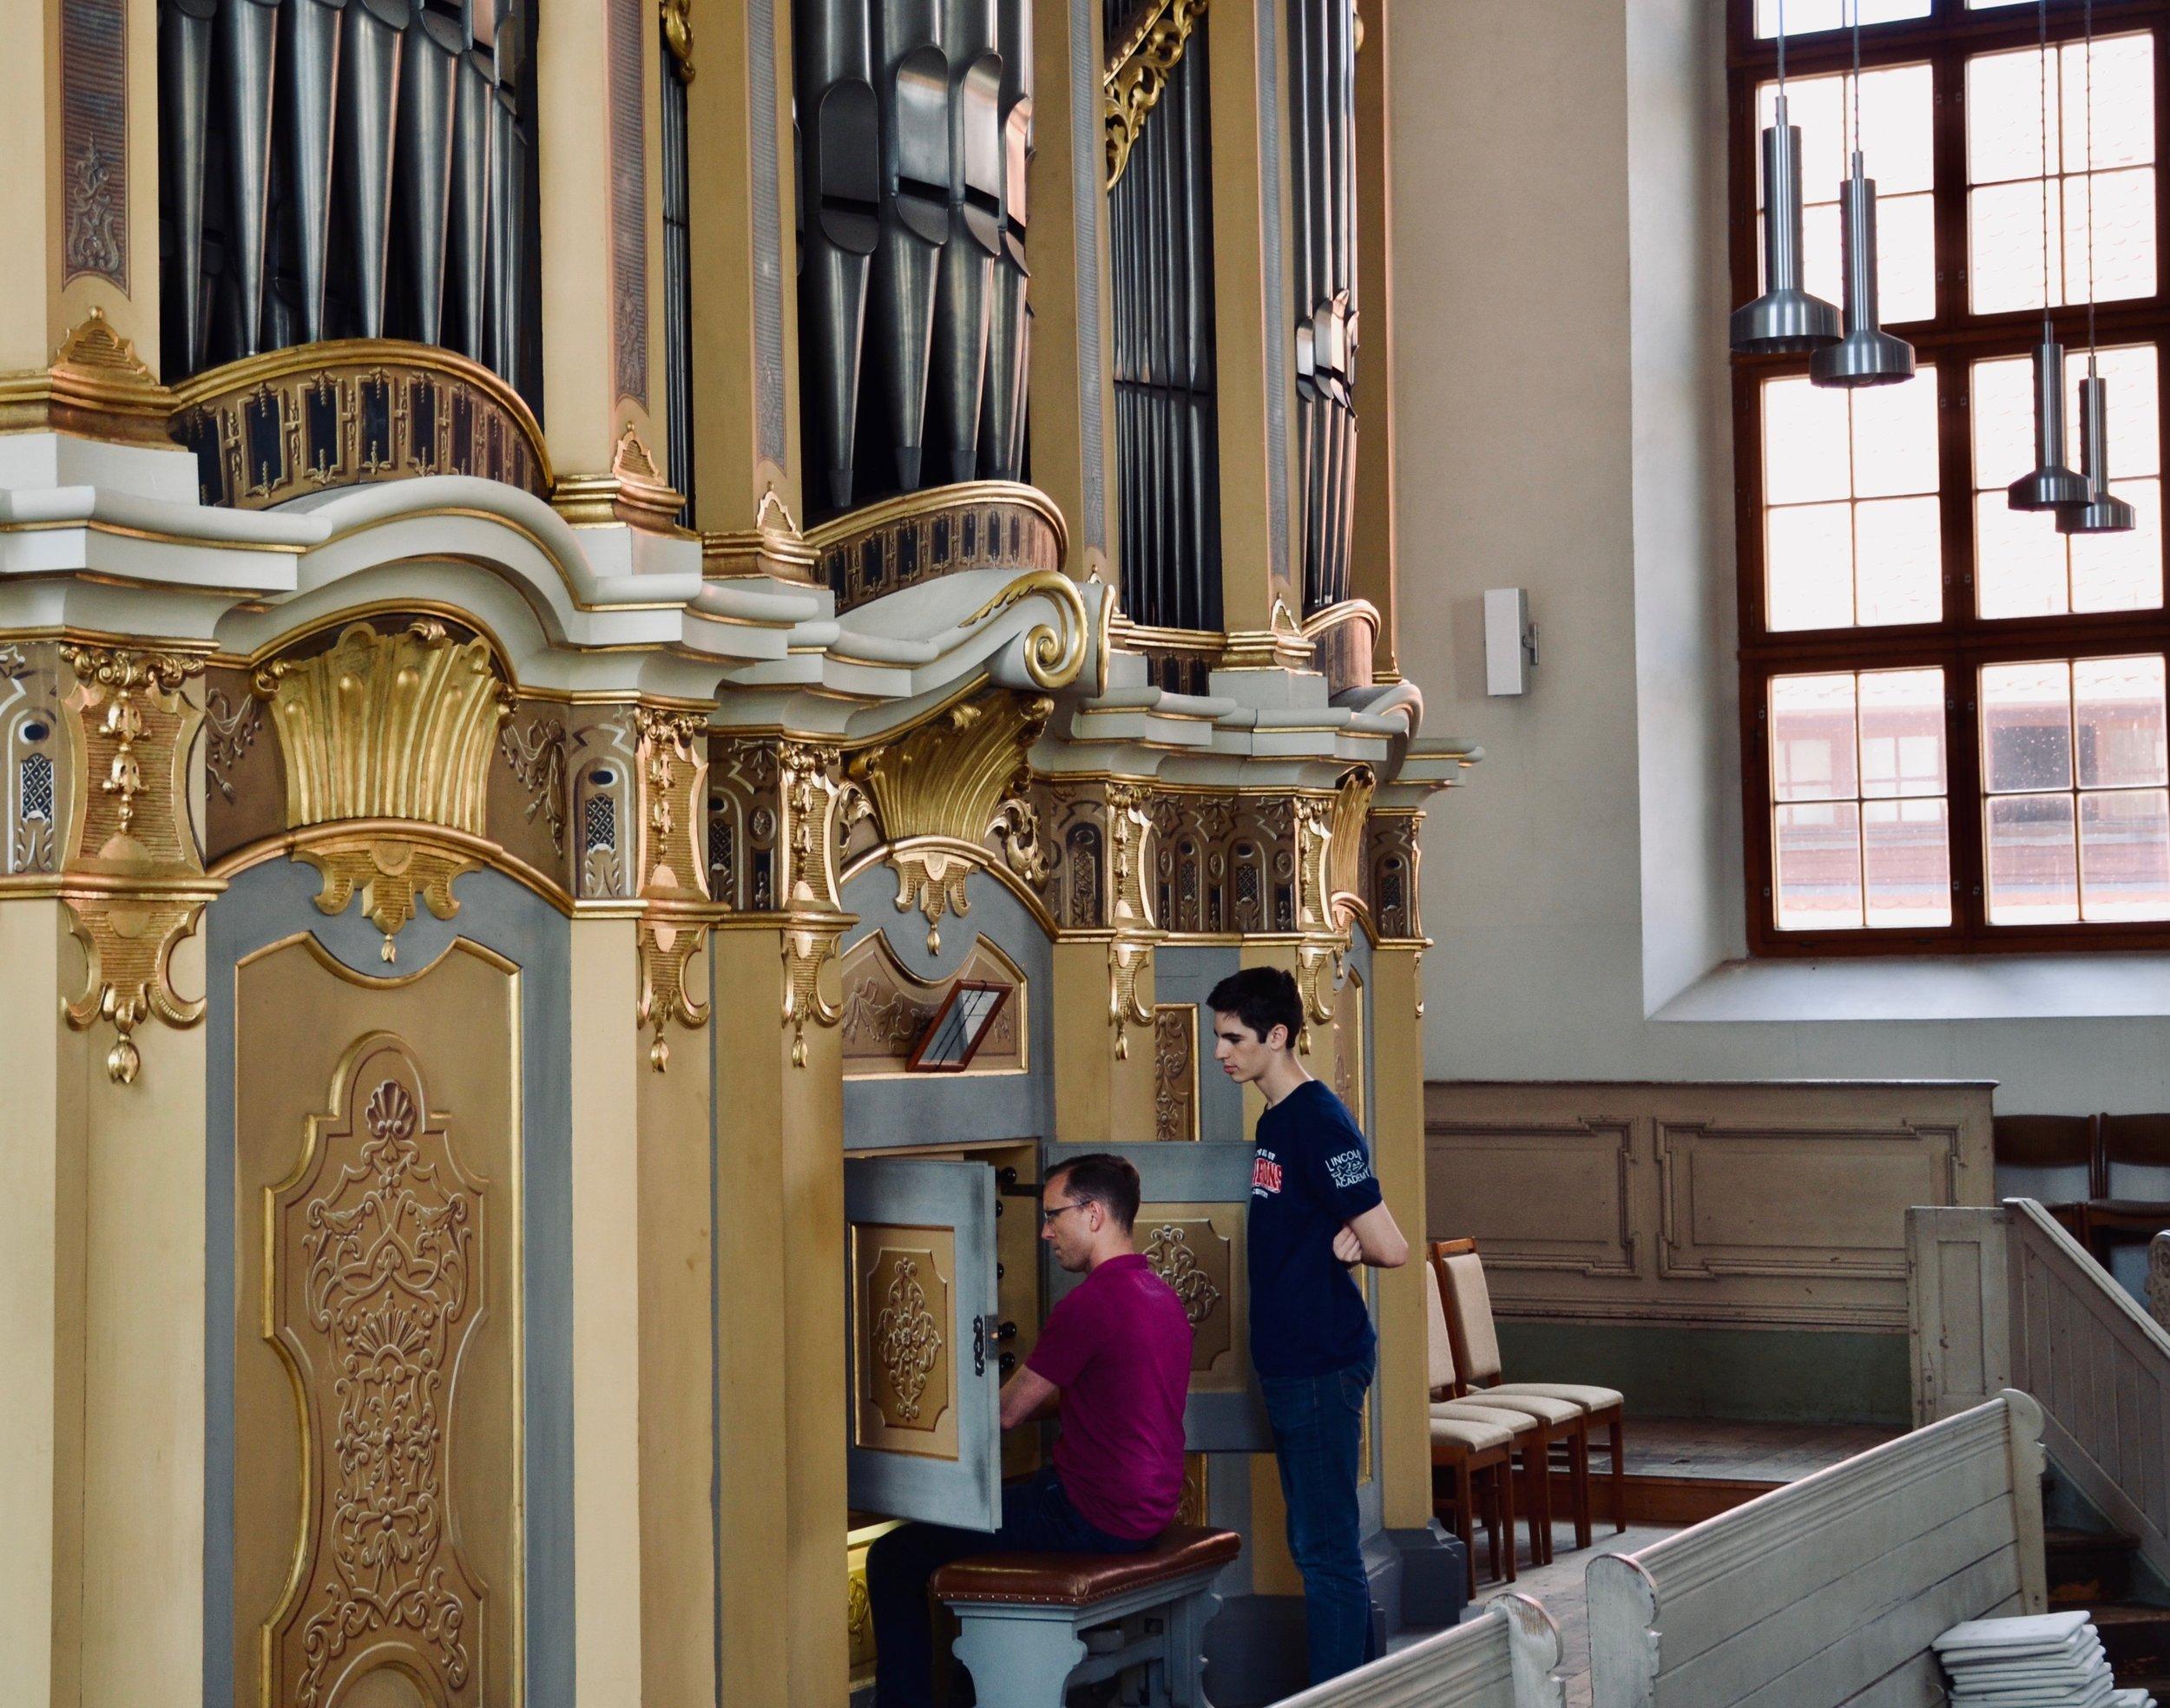 Christian Lane plays the 1735 Gottfried Silbermann organ, St. Petrikirche, Freiberg.